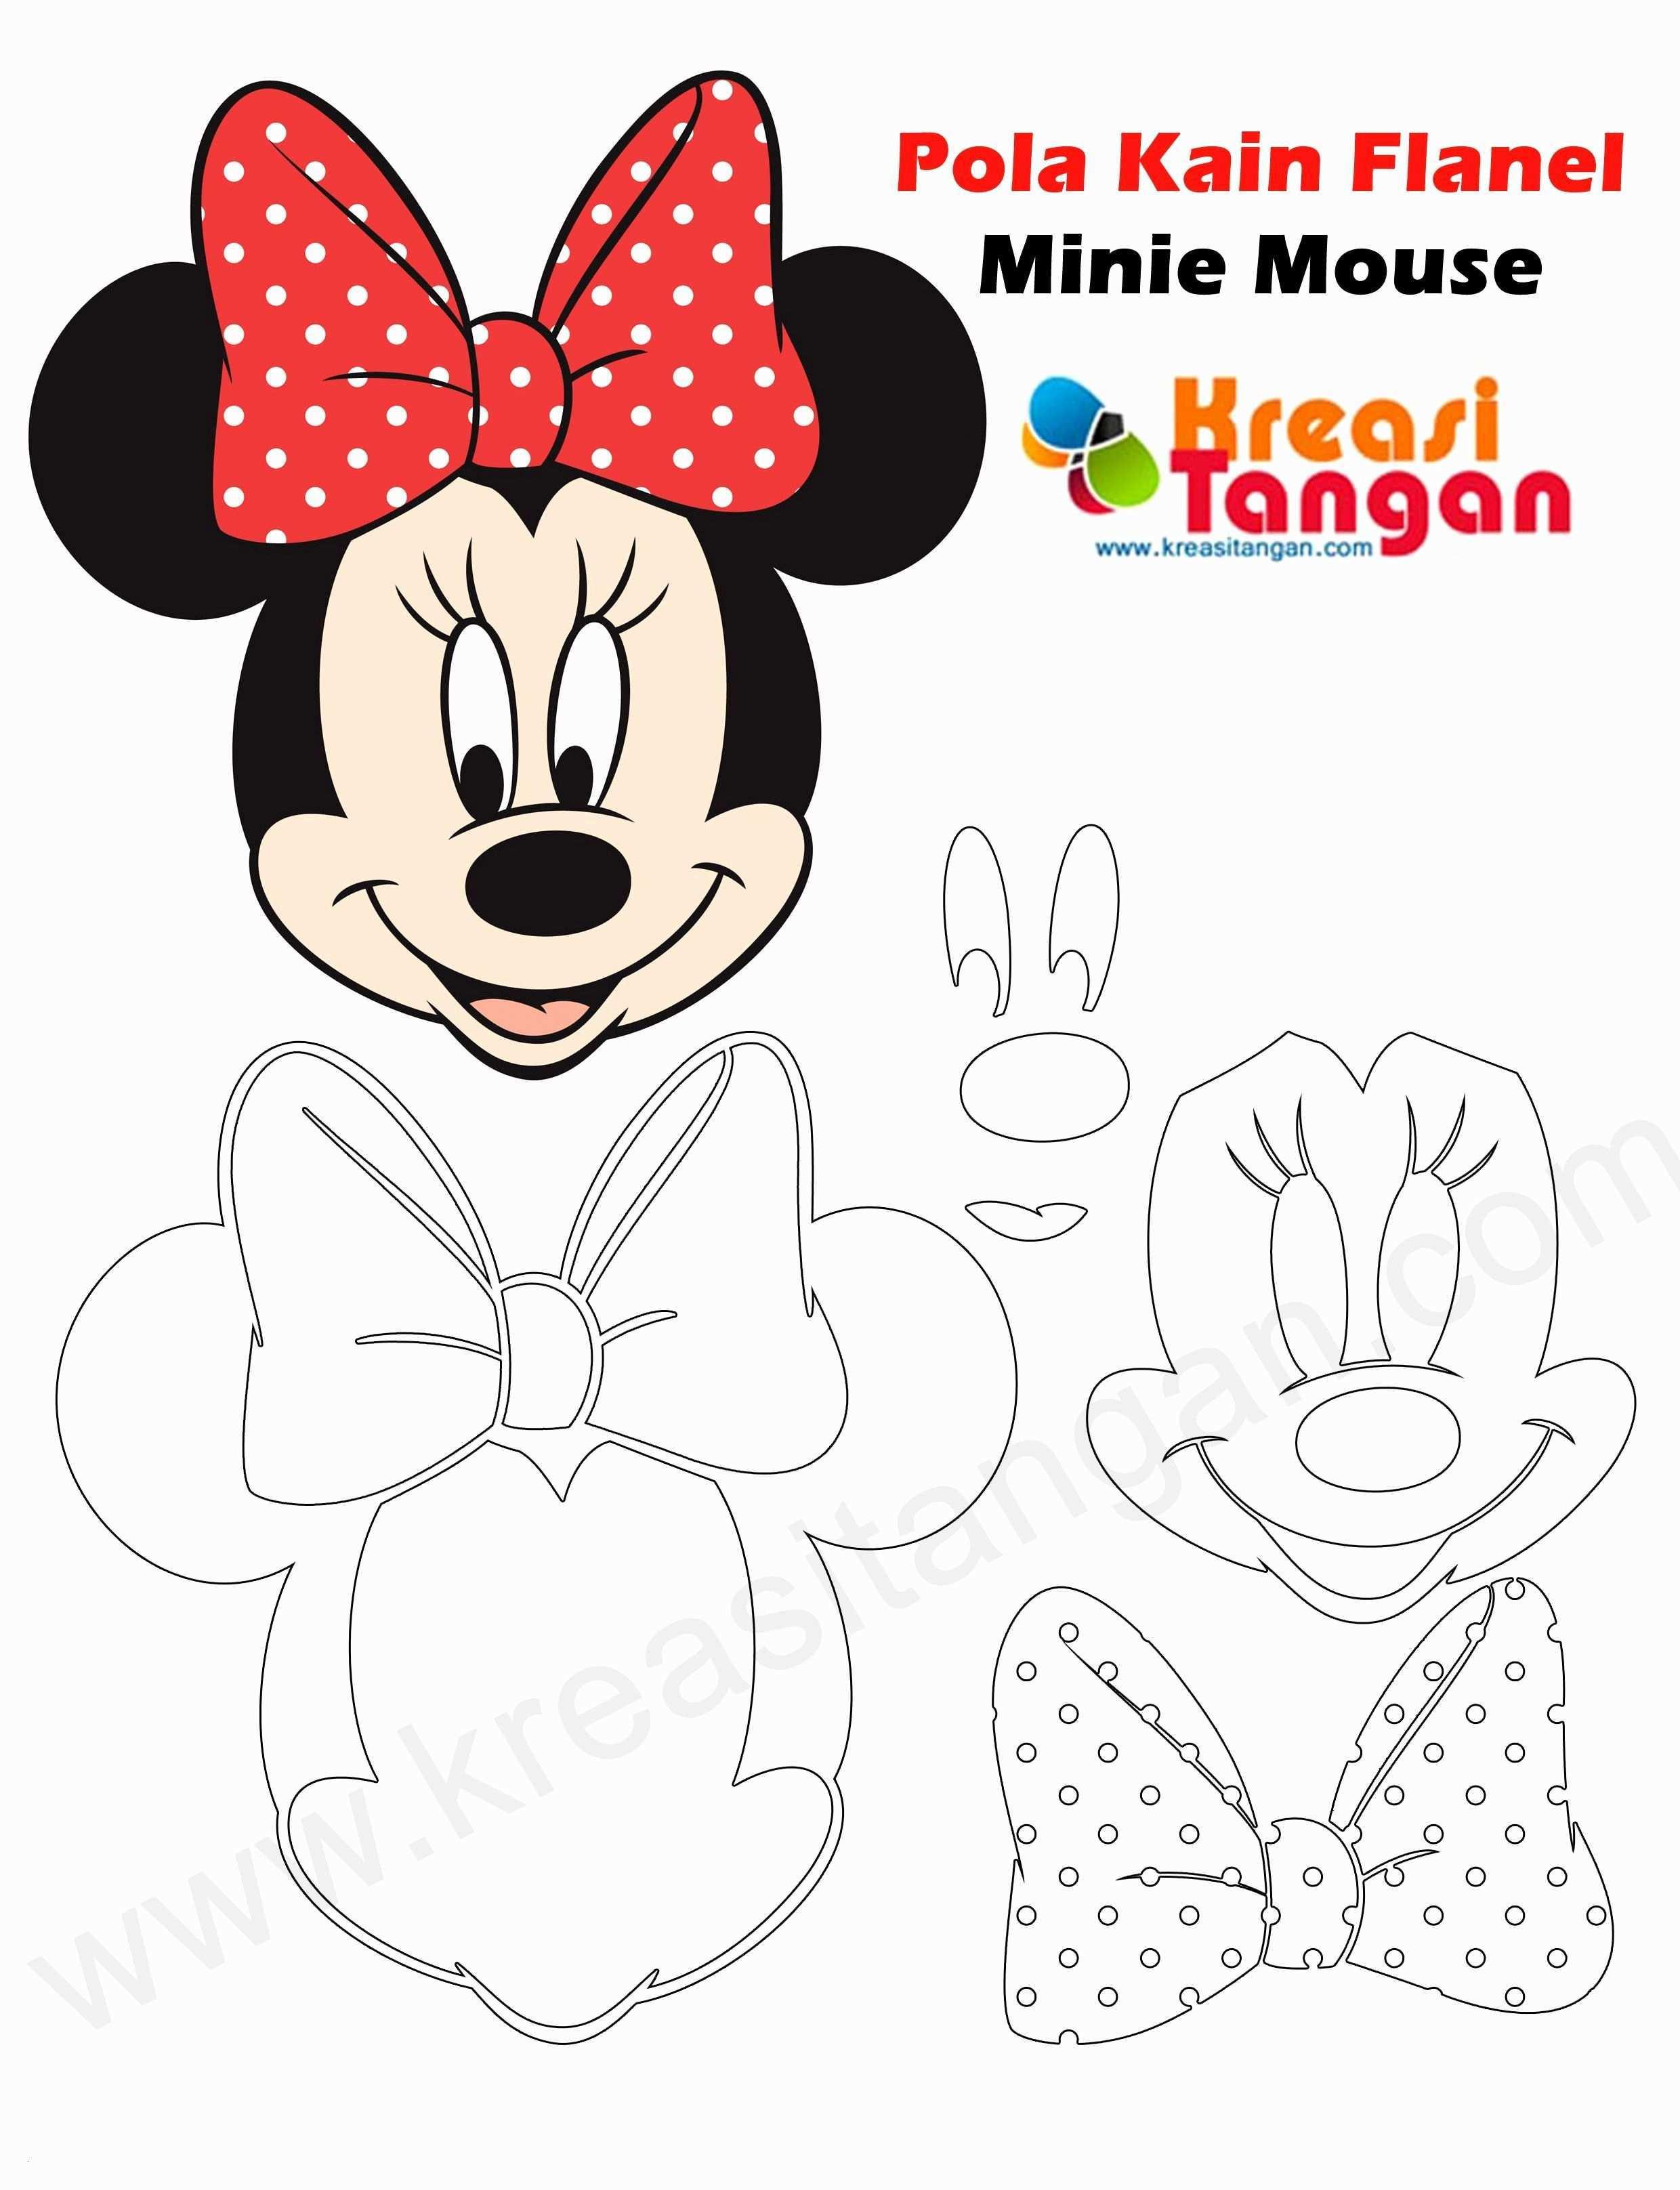 Perfect 20 Fine Baby Mickey Mouse 1st Birthday Ideas Graphics Pictures 37 Ausmalbilder Baby Micky Minnie Mouse Artesanato De Rato Aniversario Do Mickey Mouse